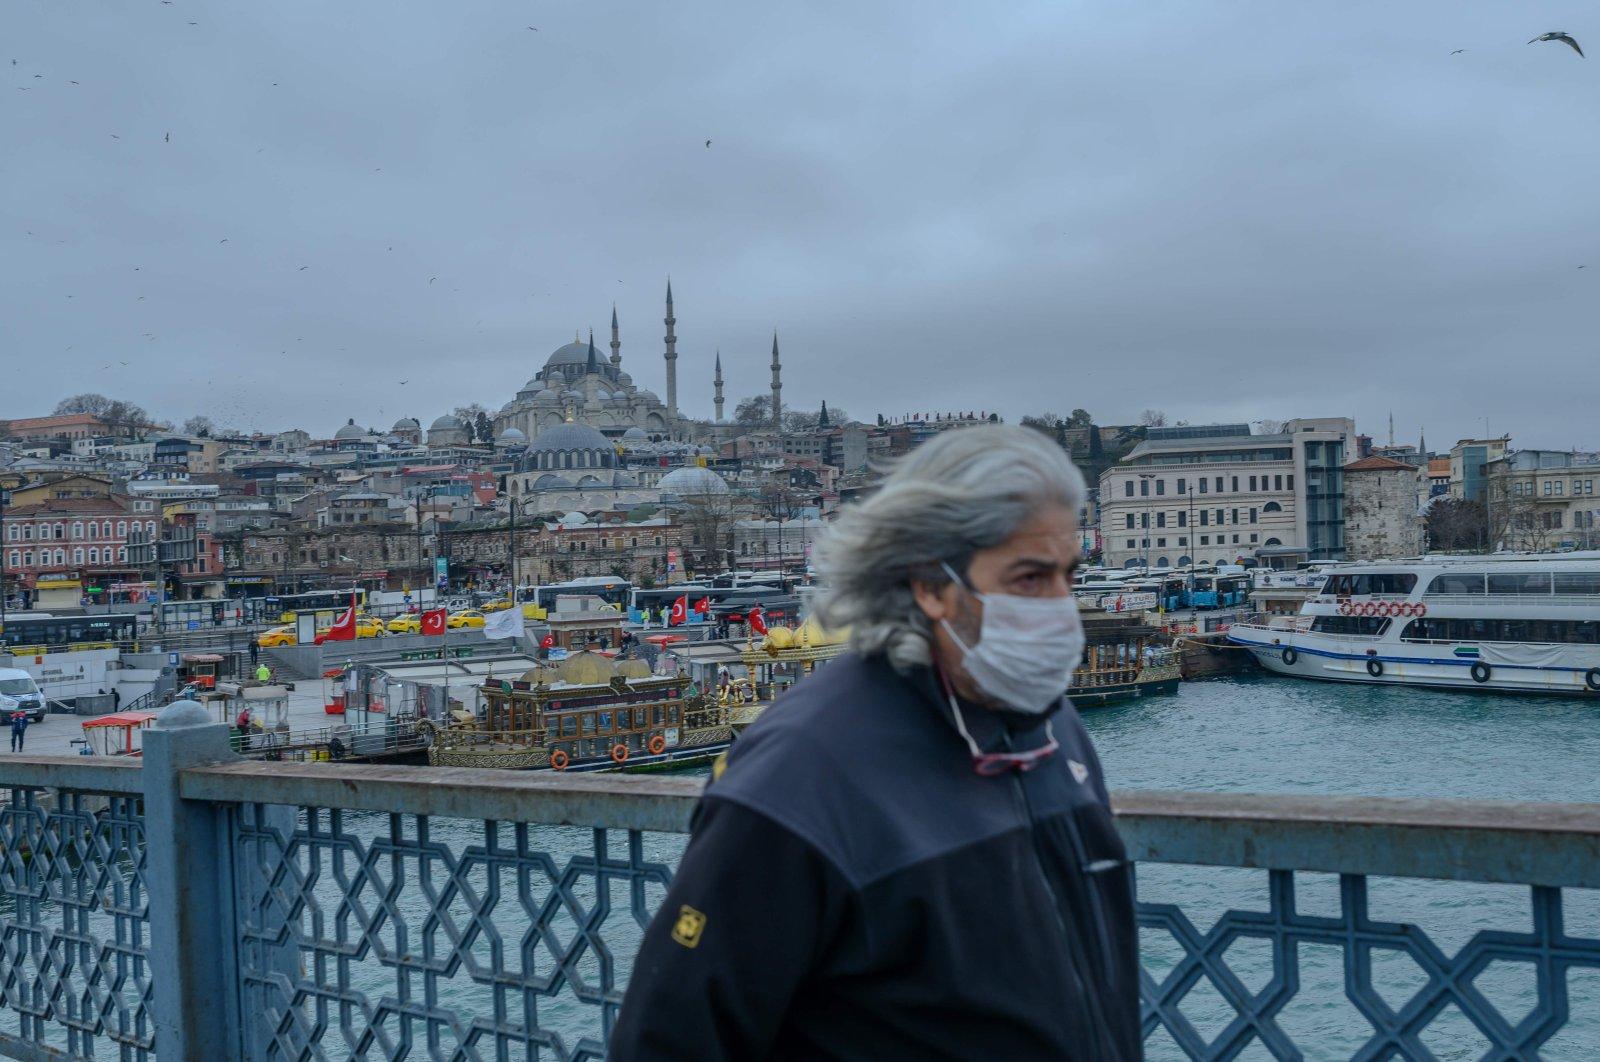 A man walks across Galata Bridge in central Istanbul, deserted due to the novel coronavirus outbreak, Thursday, March 26, 2020. (AFP Photo)